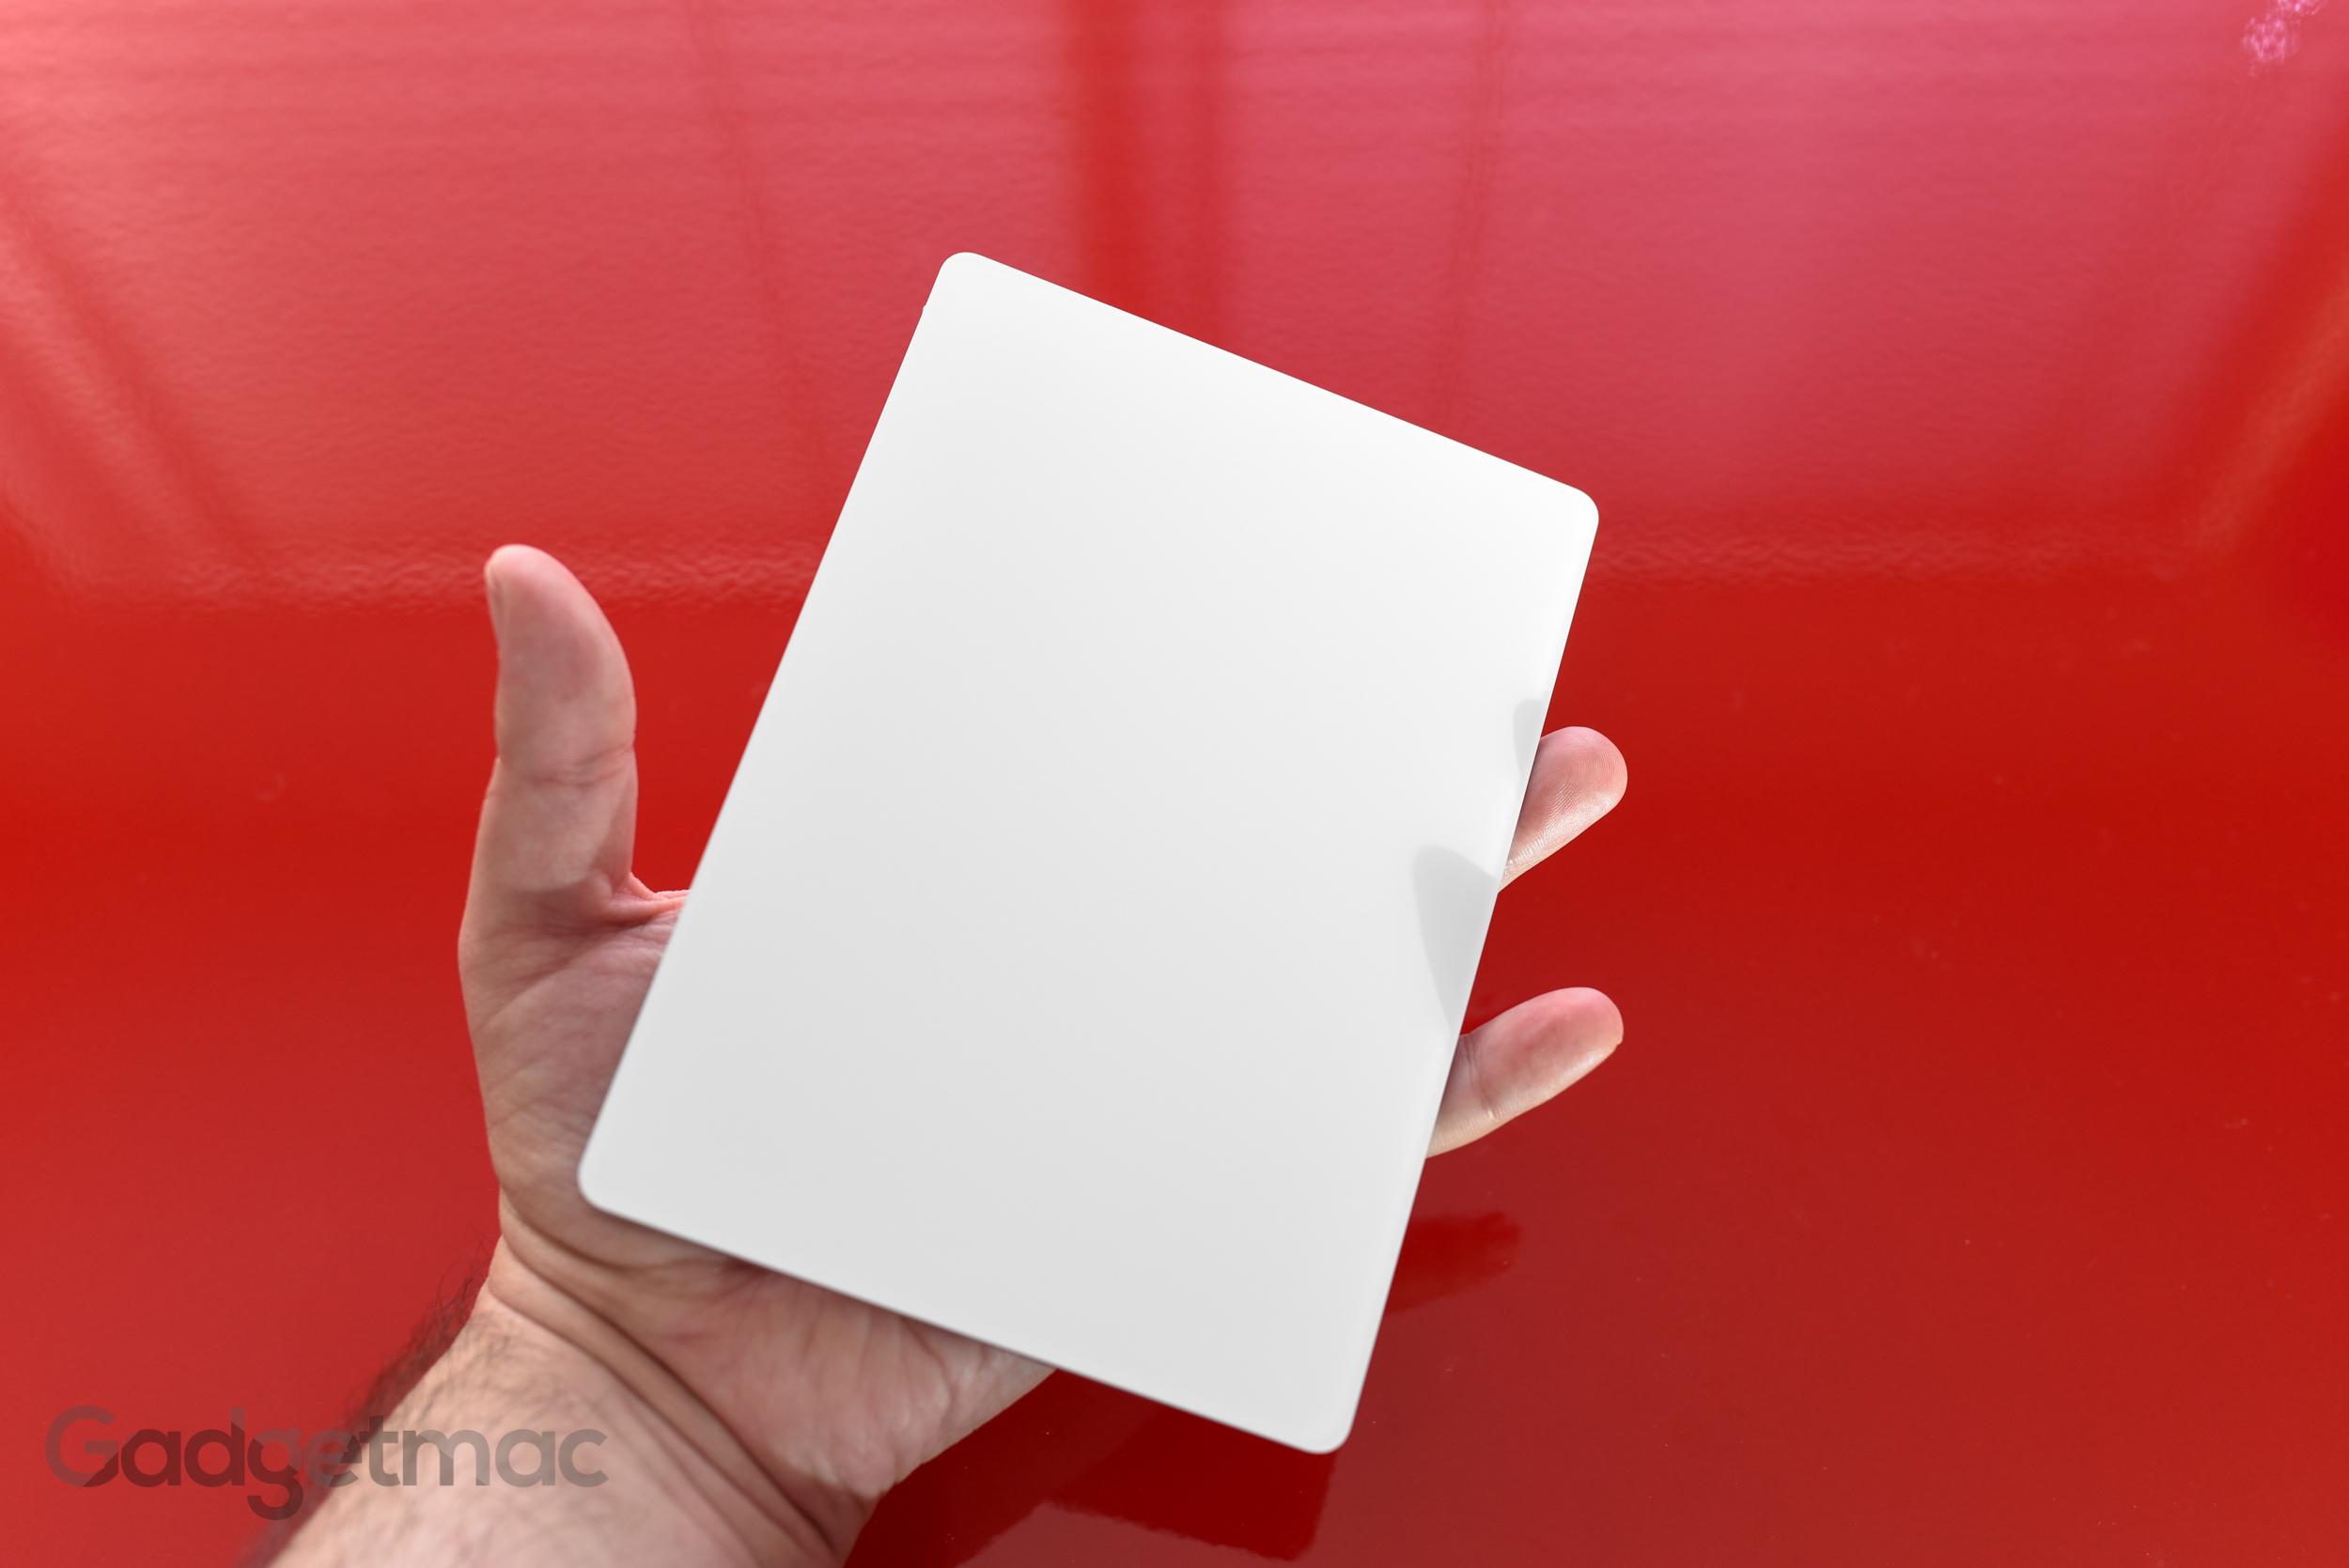 apple-magic-trackpad-2-size.jpg